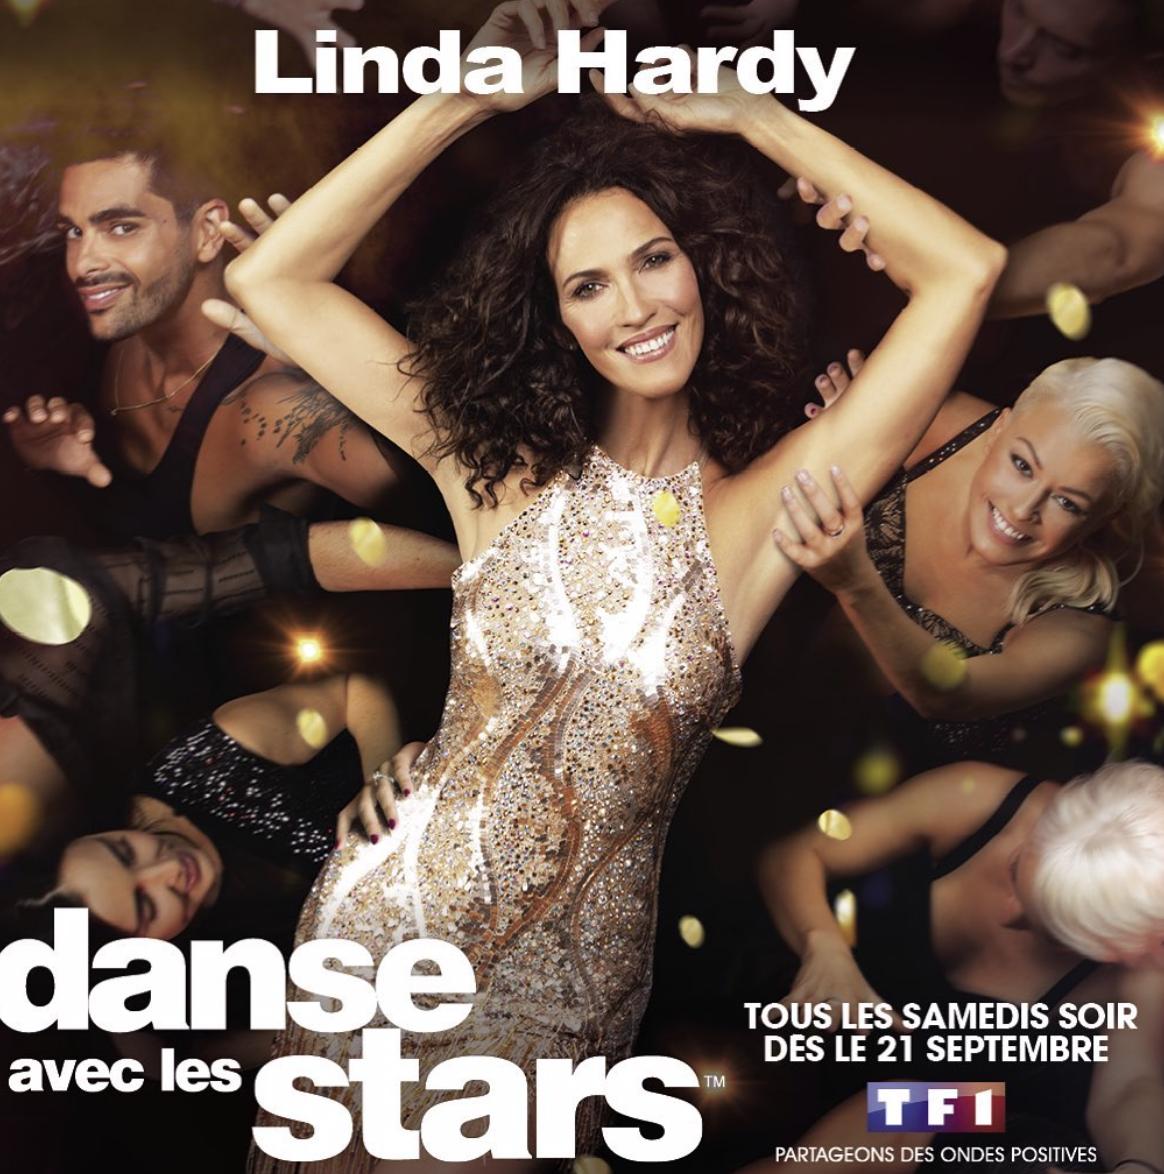 Linda Hardy - DALS 10 - DALS - Danse Avec Les Stars 10 - Danse Avec Les Stars - TF1 - Christophe Licata